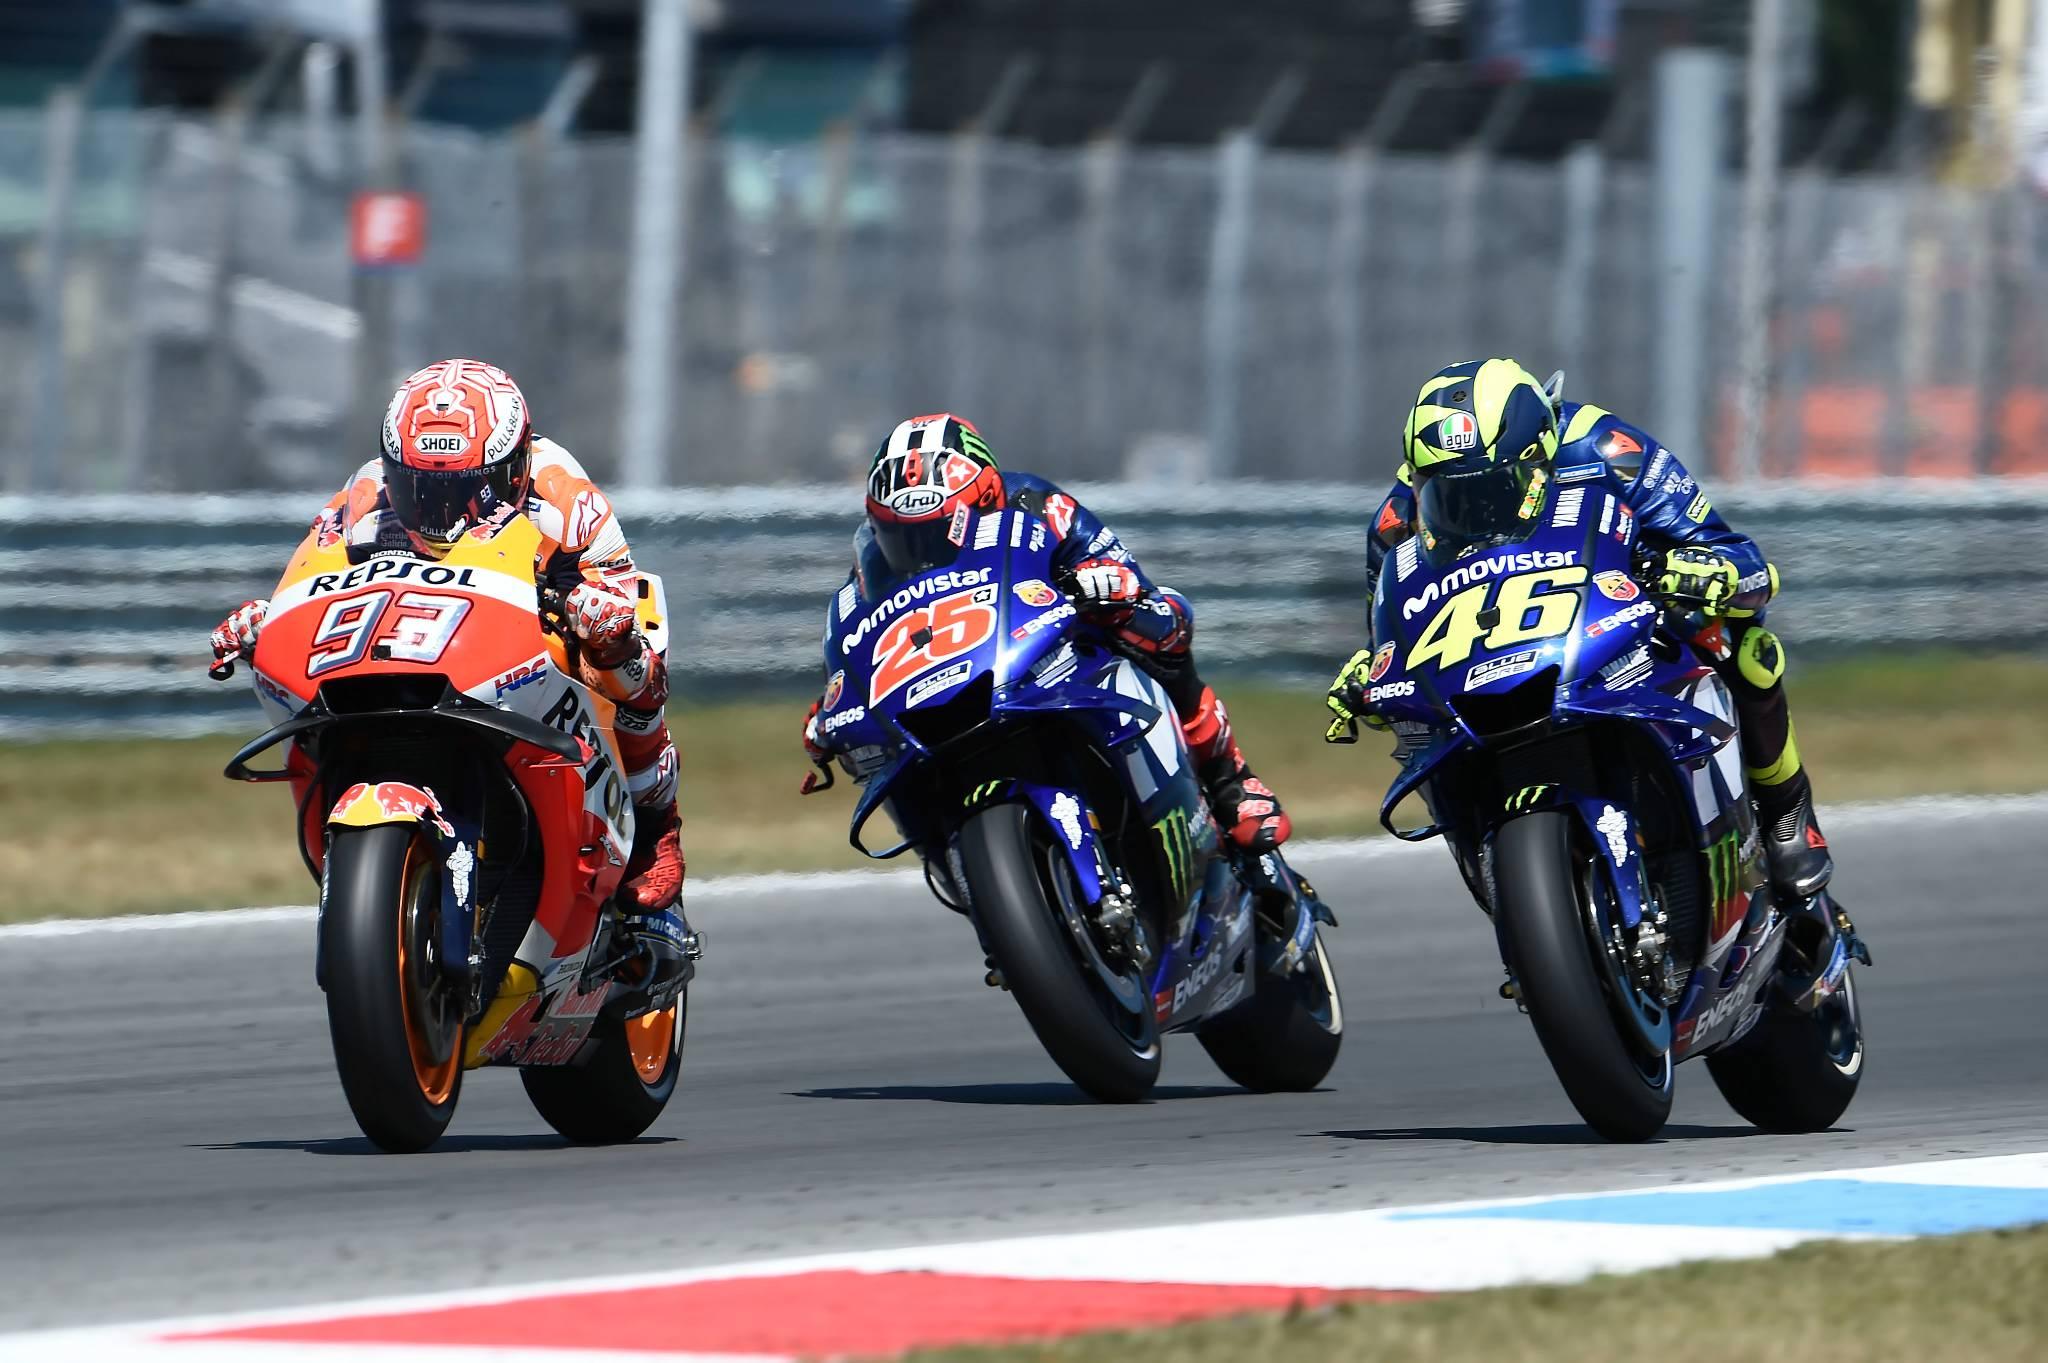 PICS: MotoGP puts on stunning show at Assen! | Feature | Crash